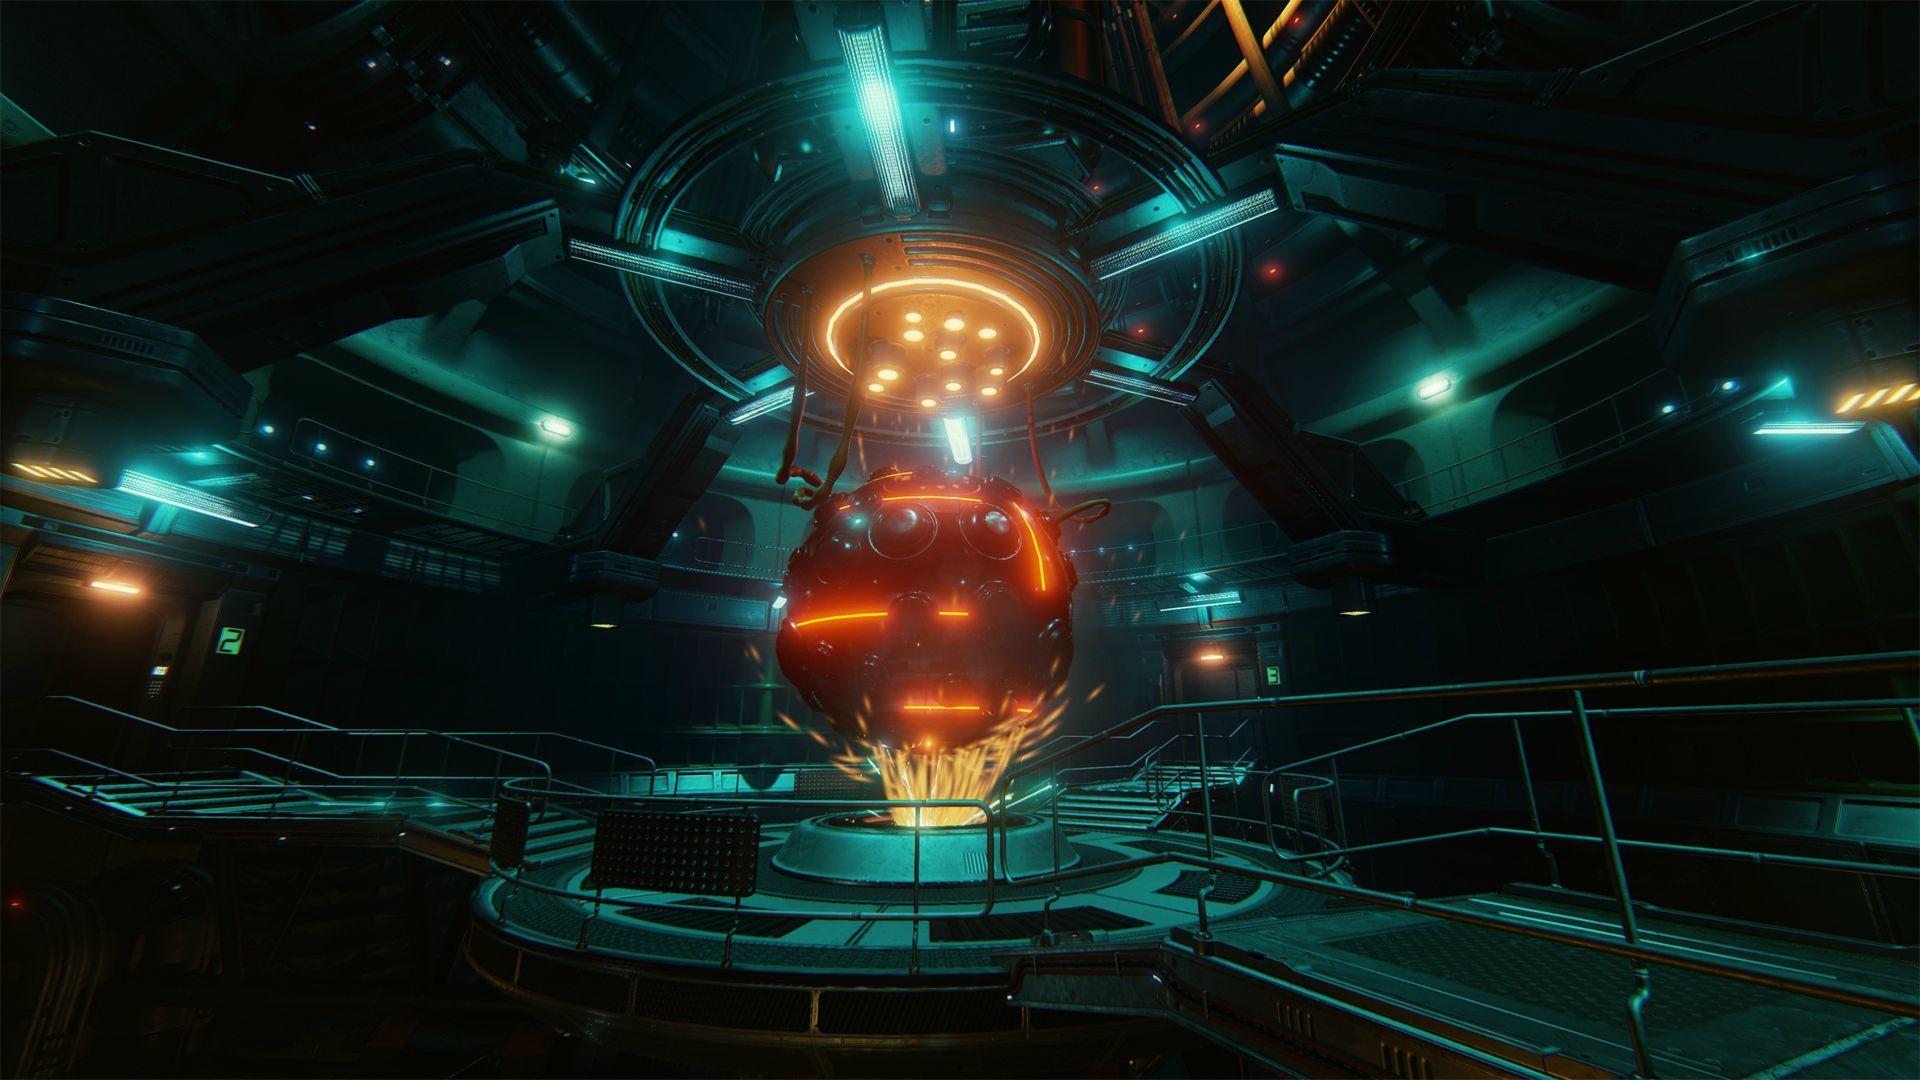 Ue4 Scifi Reactor Room Unreal Engine Forums Scifi Room Sci Fi Environment Room Concept Art